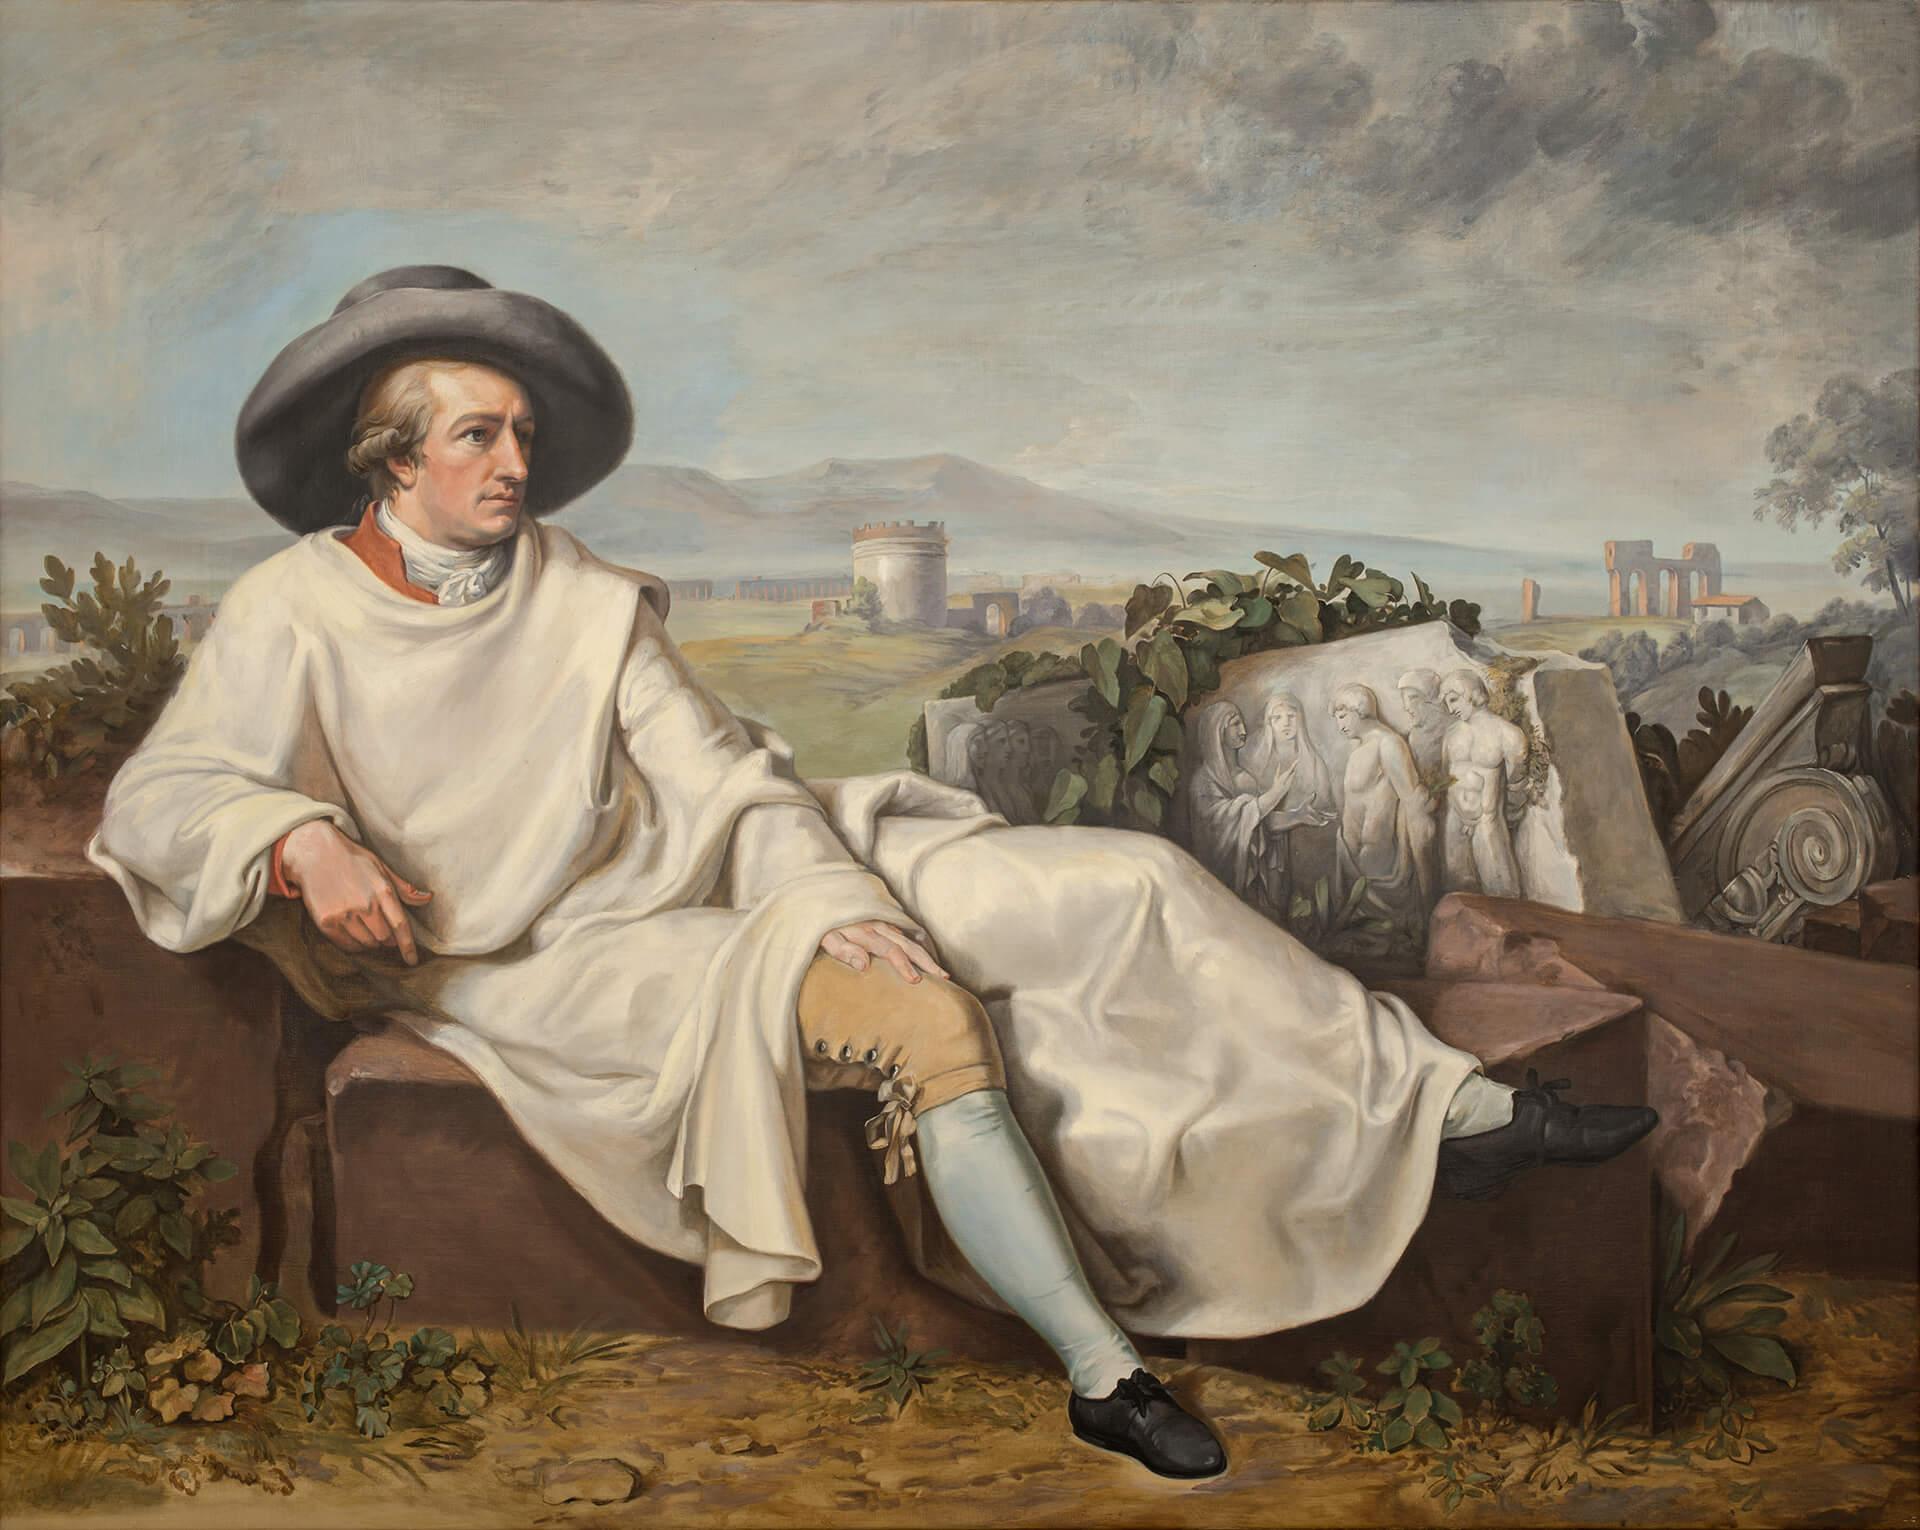 G. Takev da J. H. W. Tischbein, Goethe nella Campagna romana. 1996